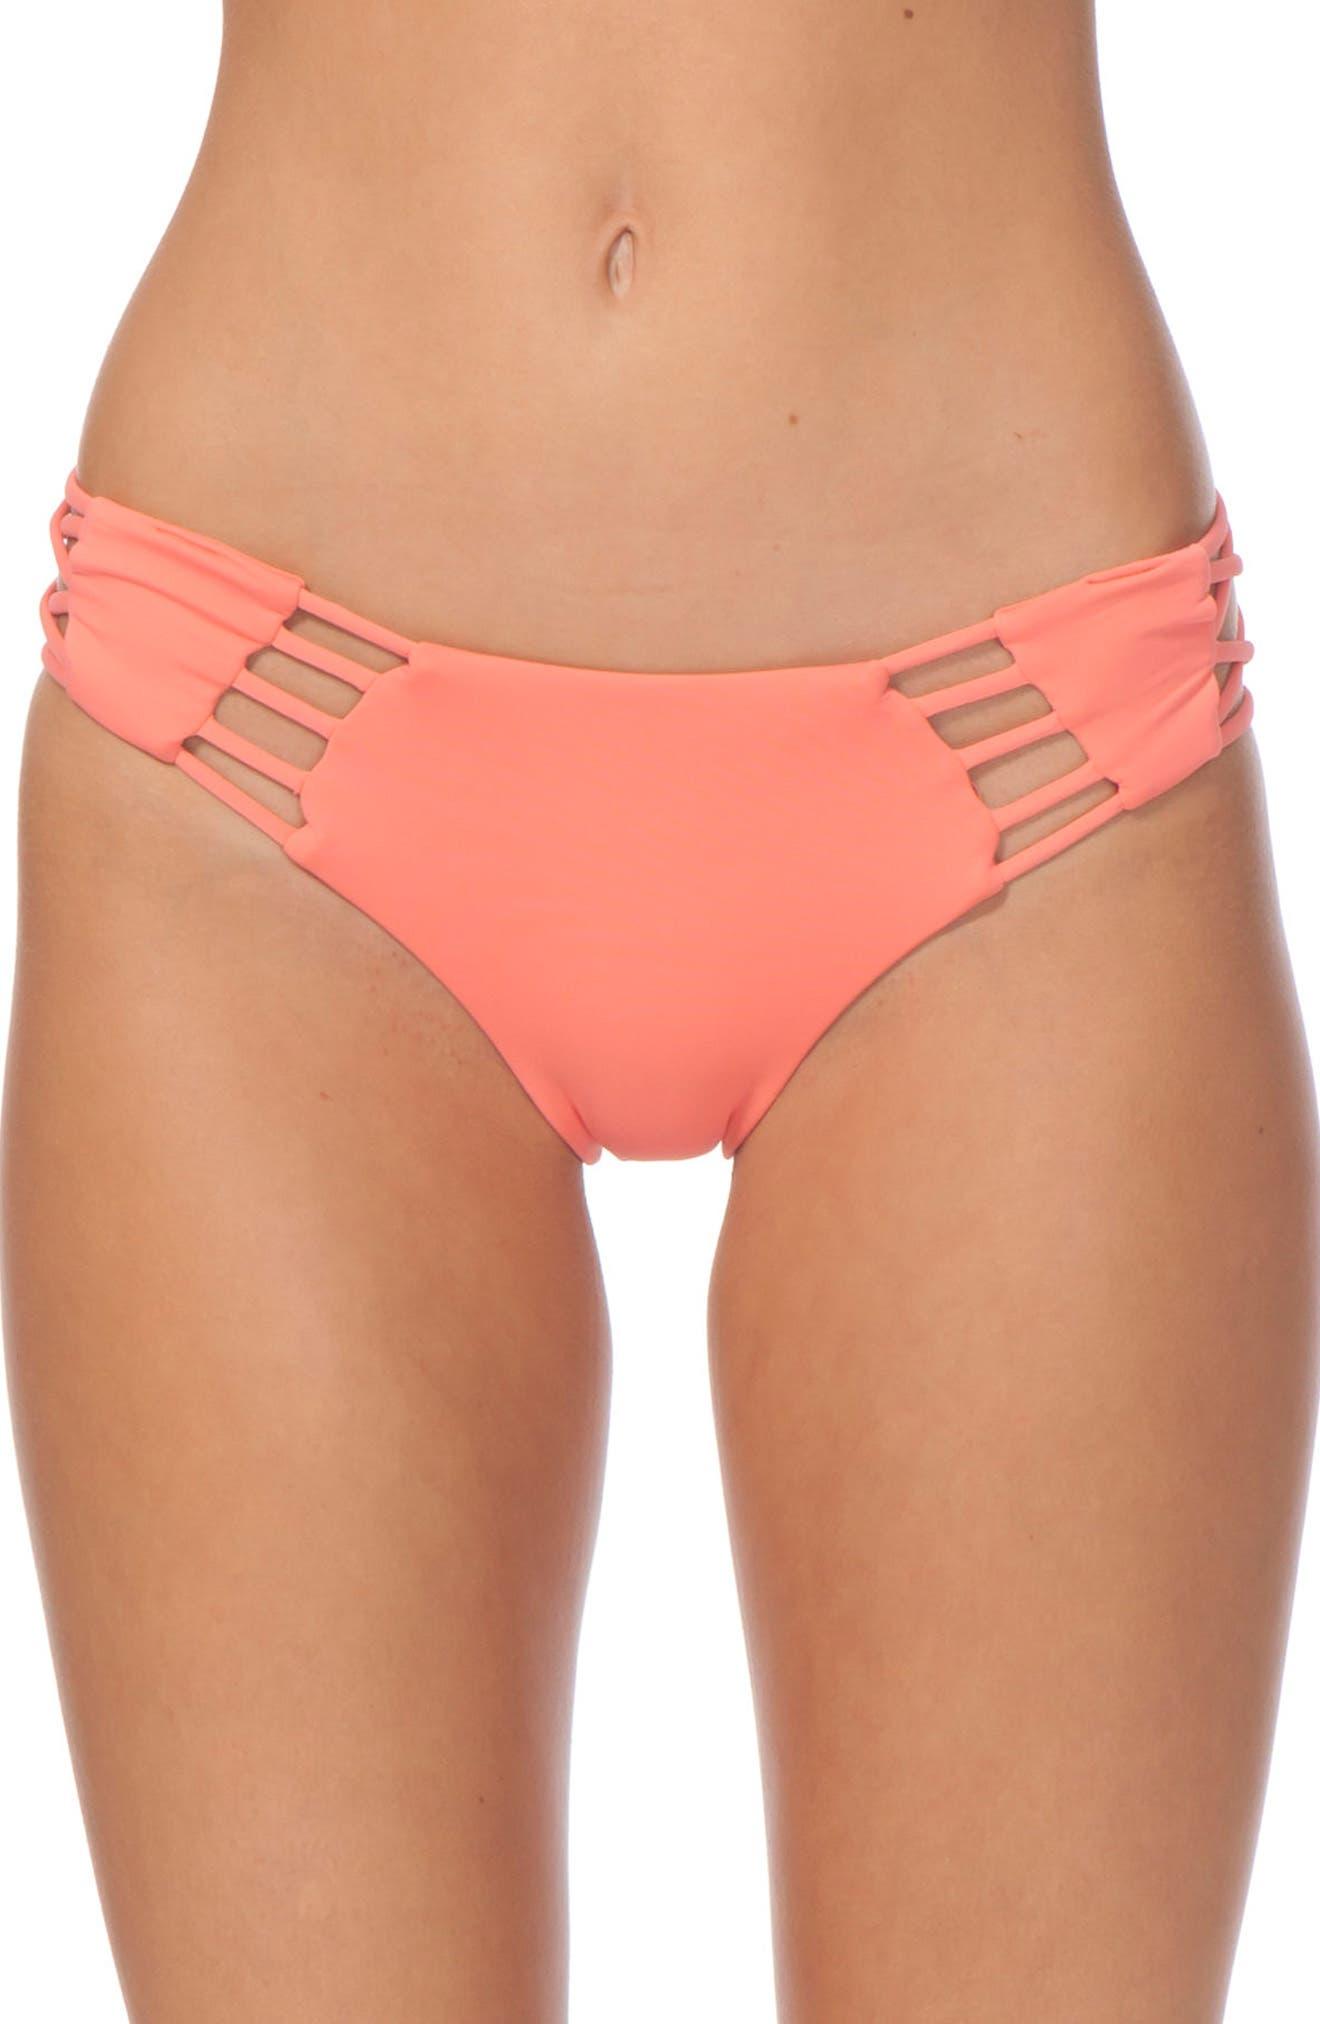 Alternate Image 1 Selected - Rip Curl Designer Surf Luxe Hipster Bikini Bottoms